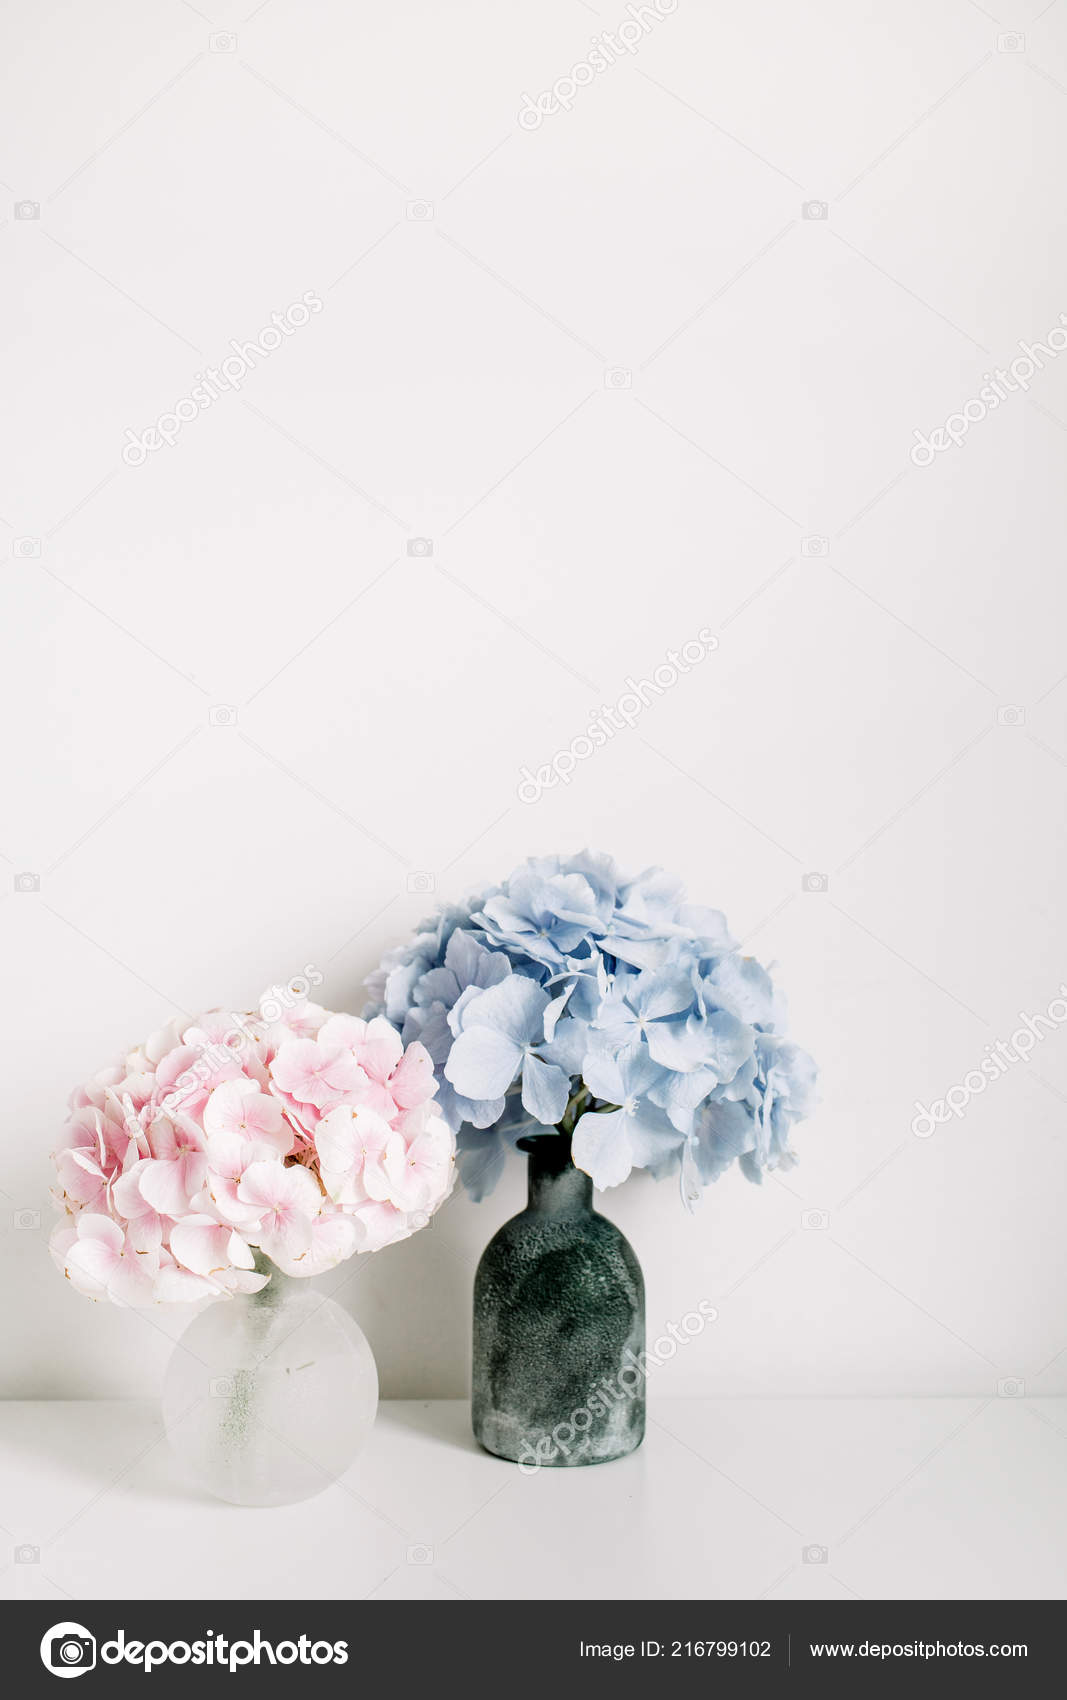 Pink And White Hydrangea Flower Arrangements Pink Blue Hydrangea Flower Bouquets White Background Minimal Interior Design Stock Photo C Maximleshkovich 216799102